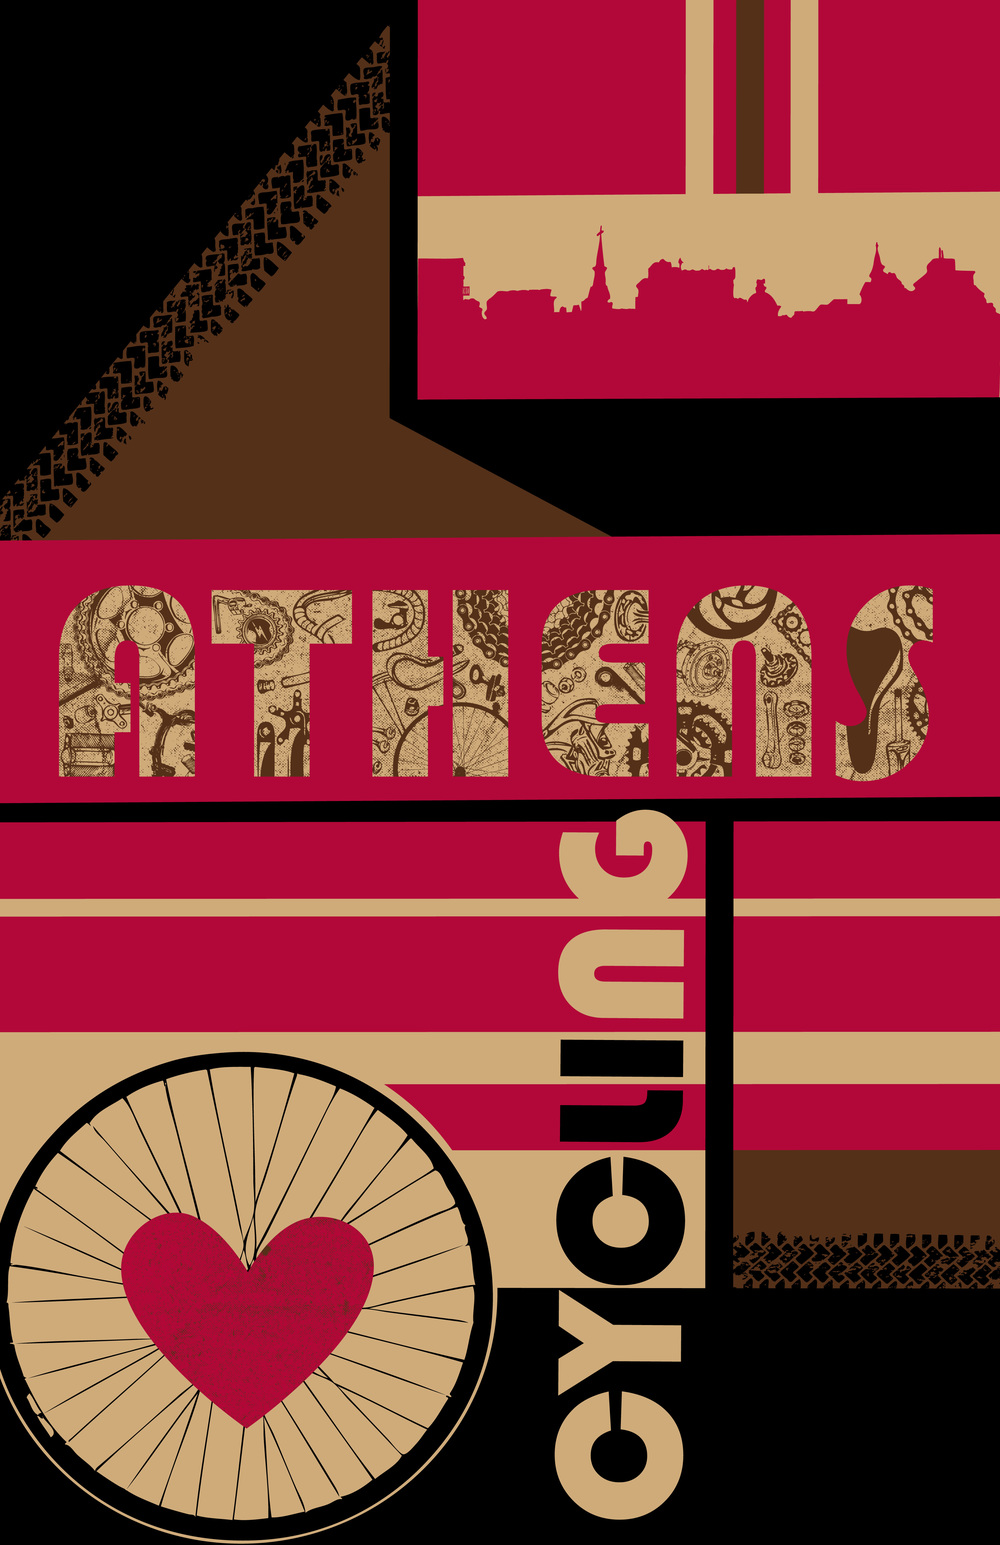 BicyclePartsPoster-01.jpg